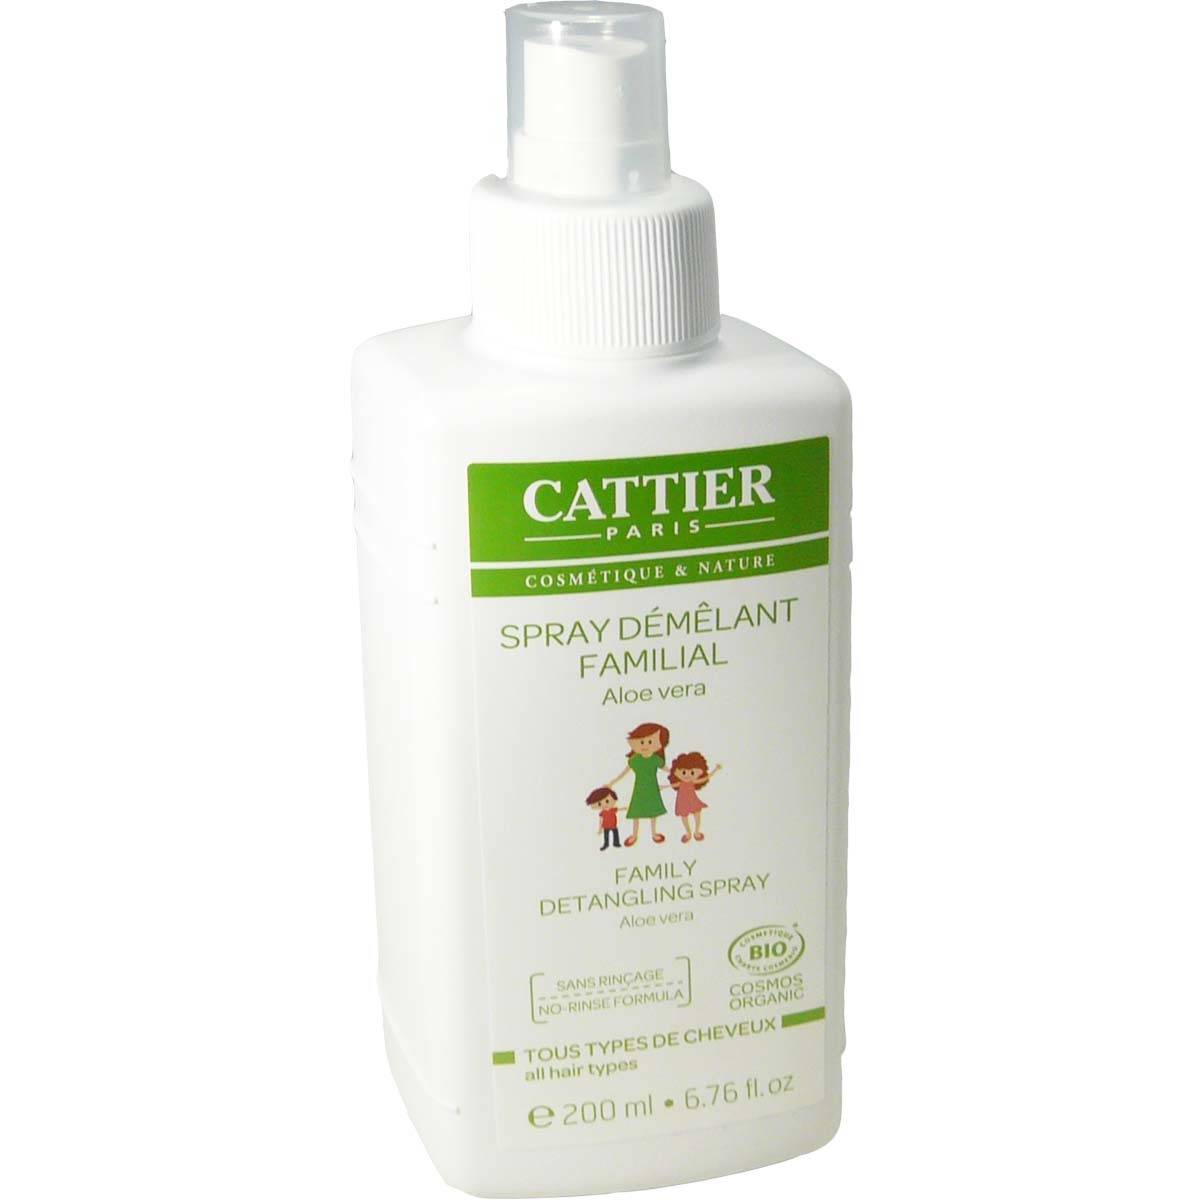 Cattier spray demelant familial a l'aloe vera 200ml